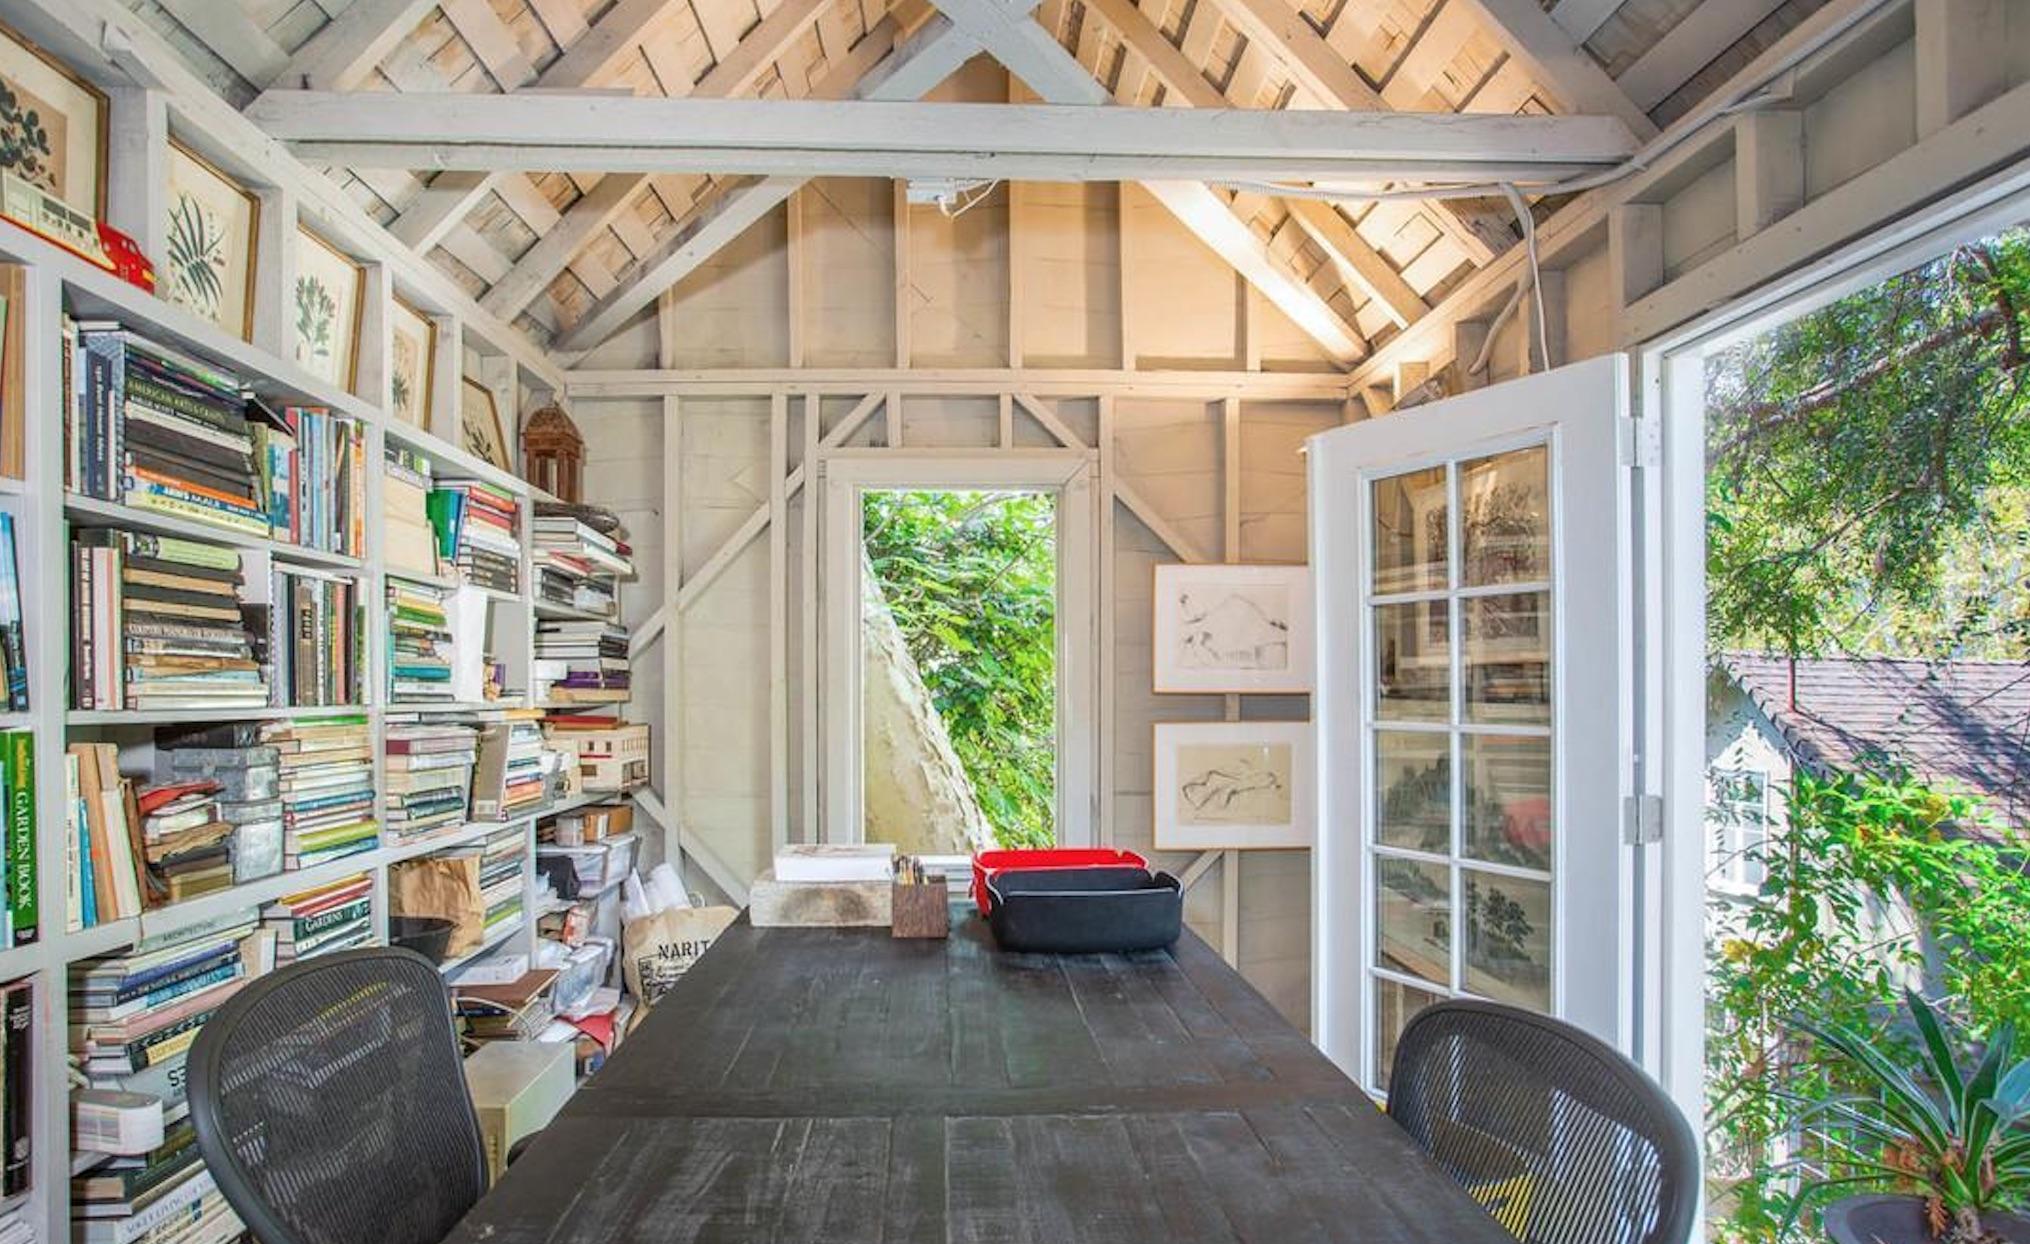 Enchanting English Cottage - 3032 Windsor Ave, Los Angeles, CA 90039-8.jpg